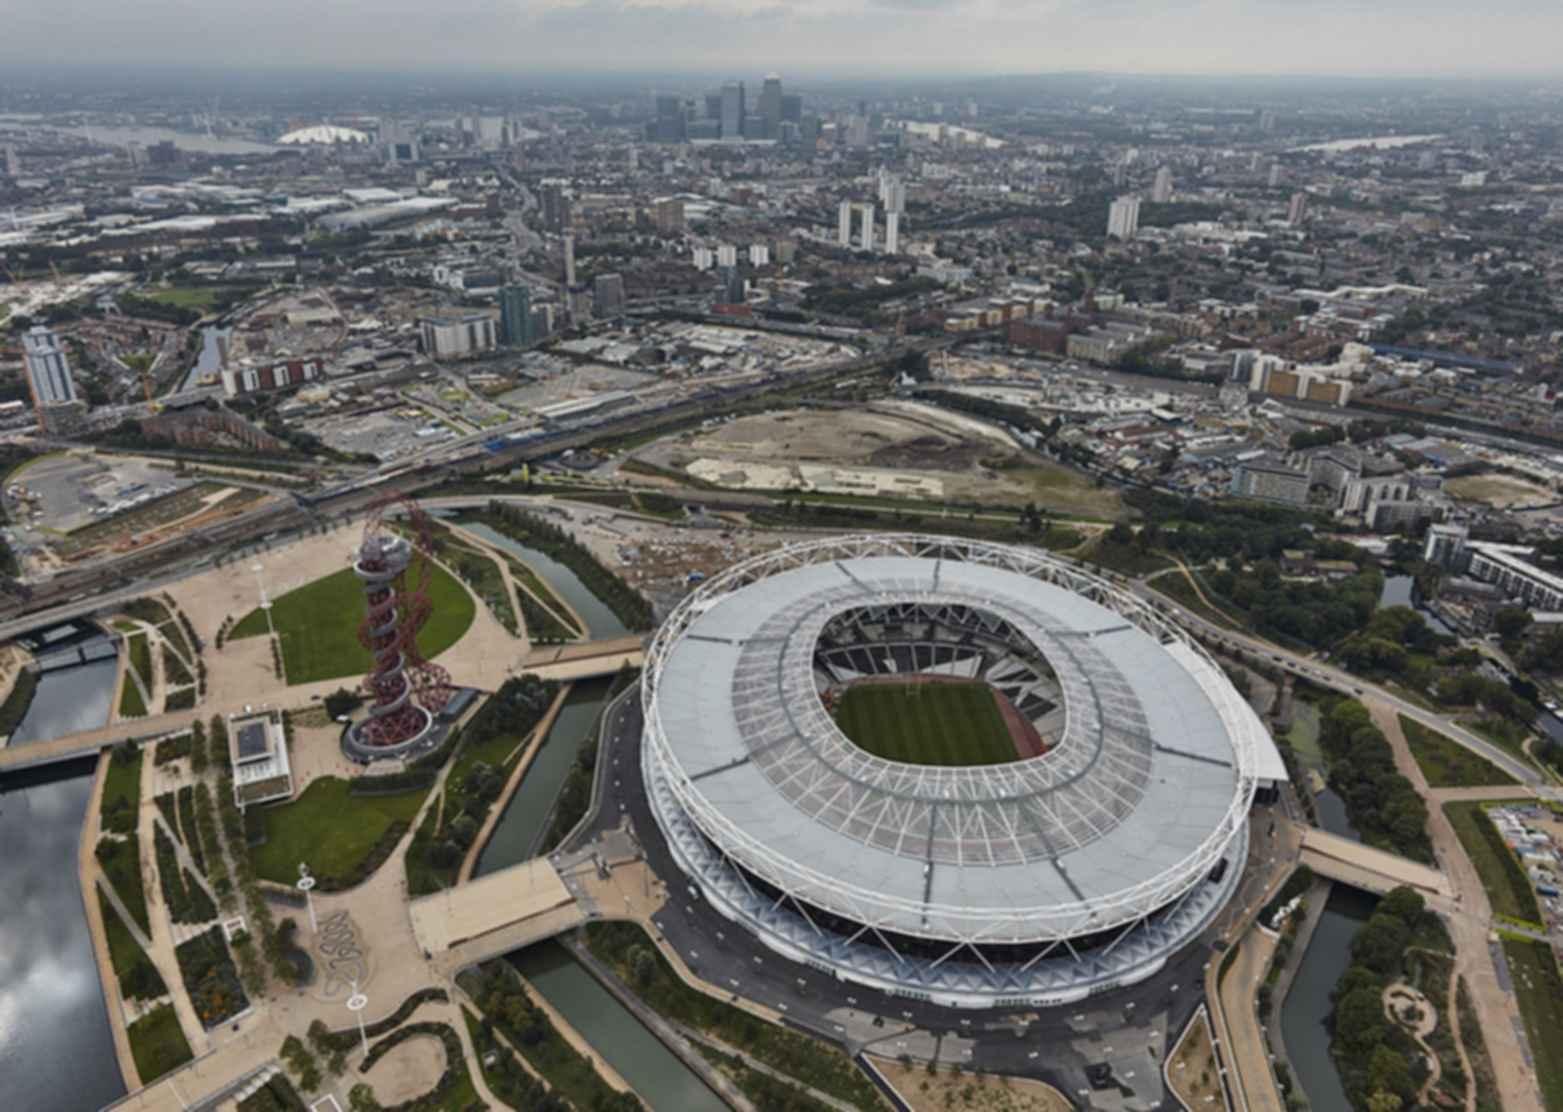 London Olympic Stadium - Exterior/Landscape